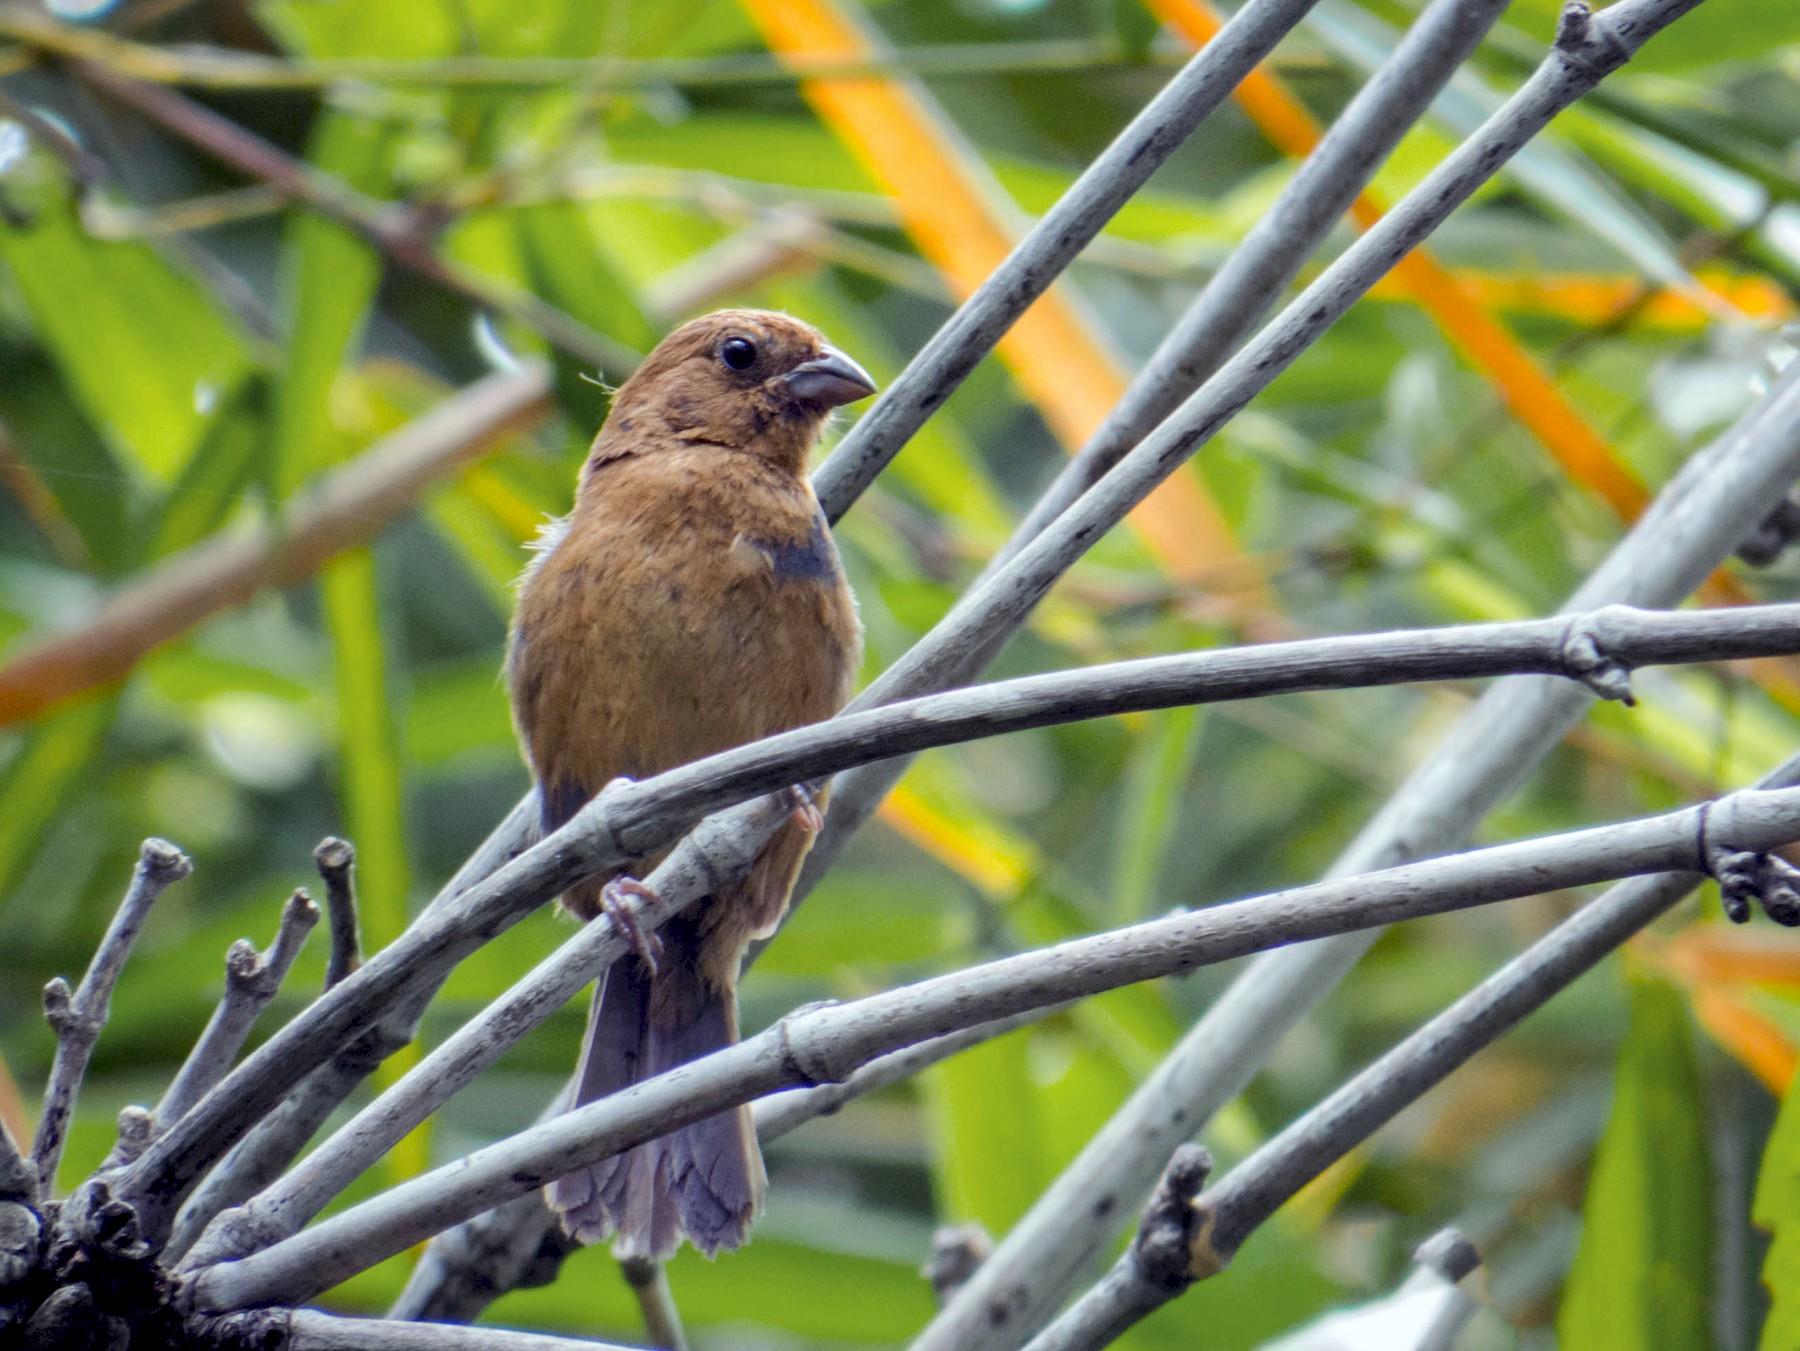 Blue Seedeater - Josue  de León Lux (Birding Guide) josuedeleonlux@gmail.com +502 3068 8988